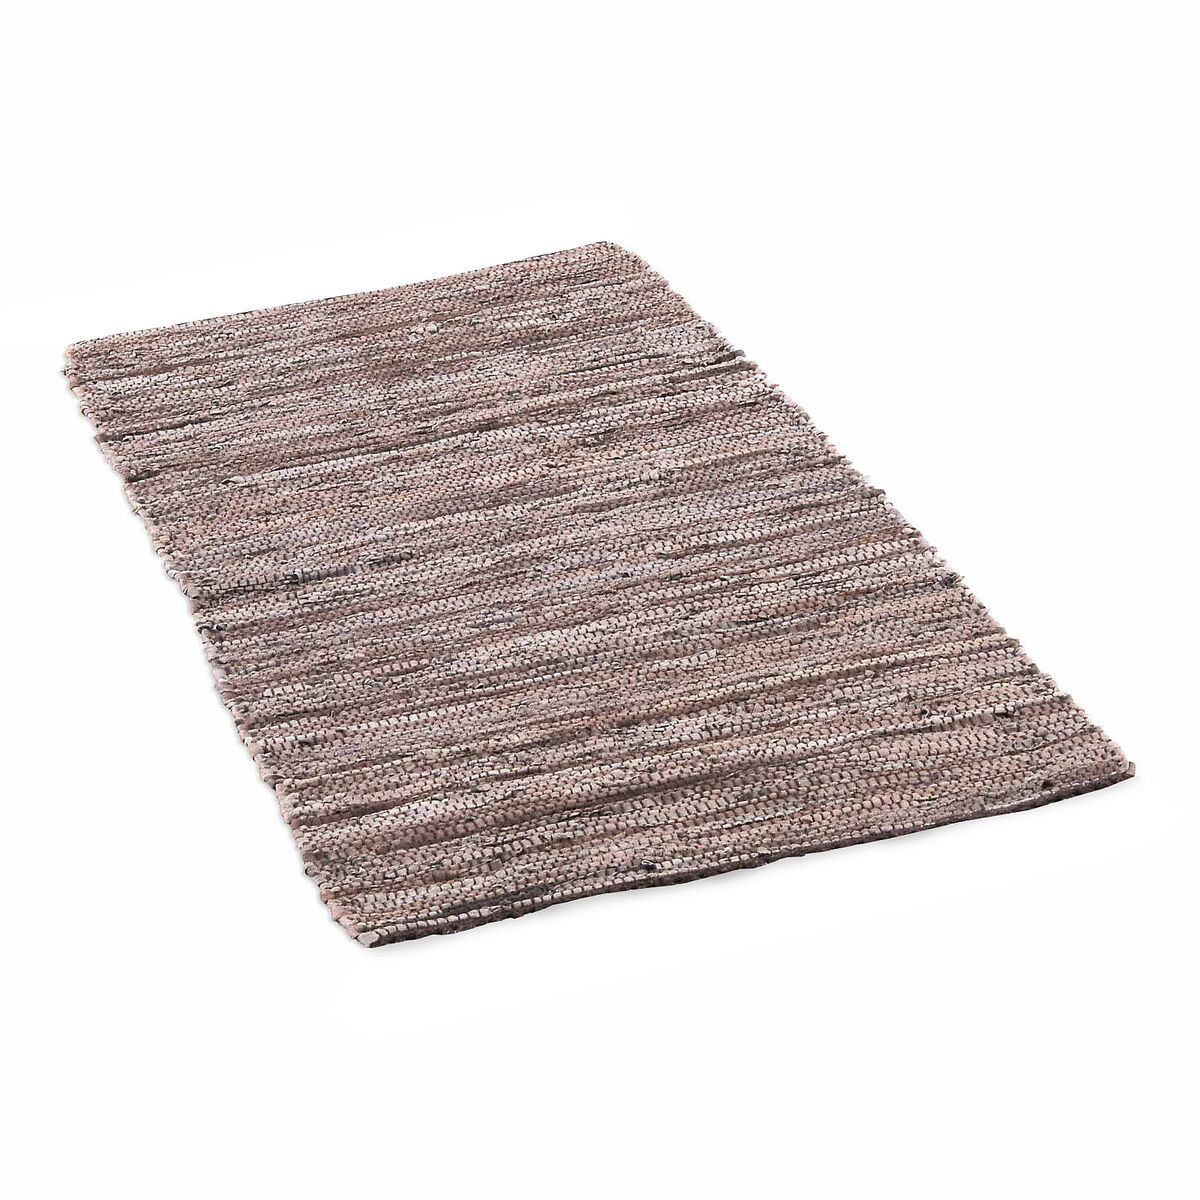 teppich aus recyceltem leder ca b 60 x l 140cm braun depot de. Black Bedroom Furniture Sets. Home Design Ideas